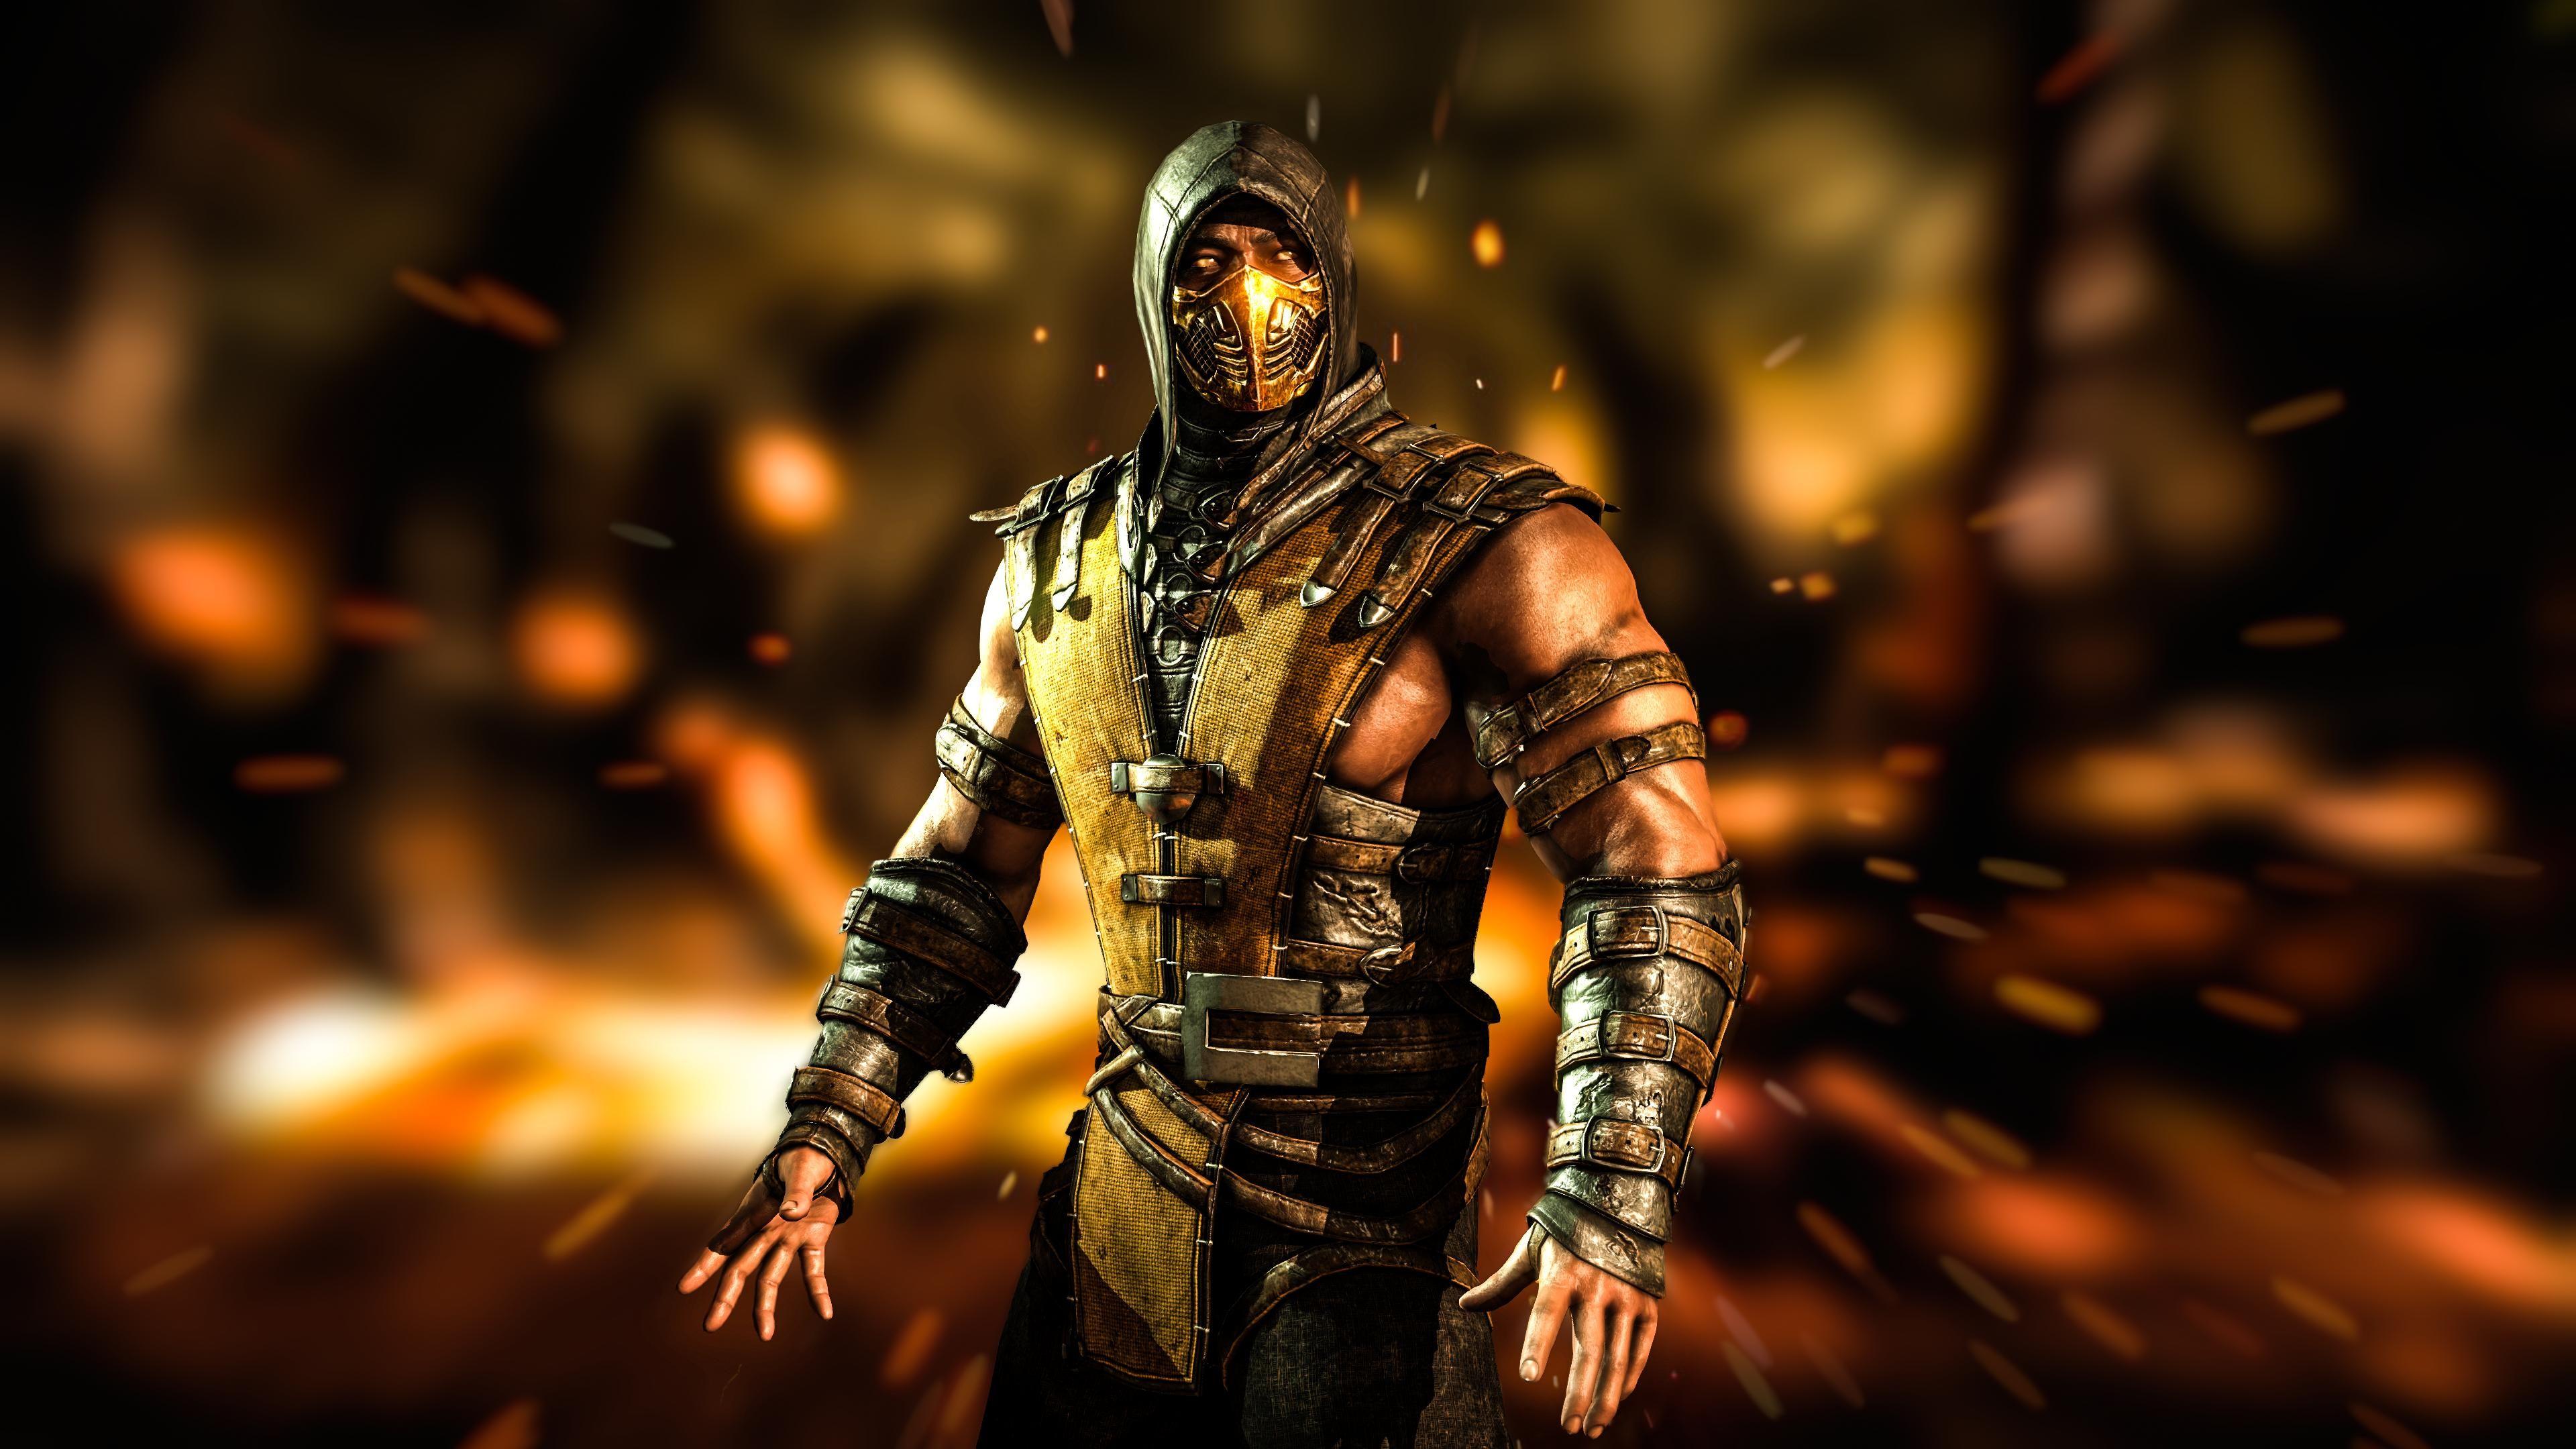 Mortal Kombat X Scorpion Wallpaper HD Desktop WIdescreen | Mortalkombat | Mortal kombat x ...